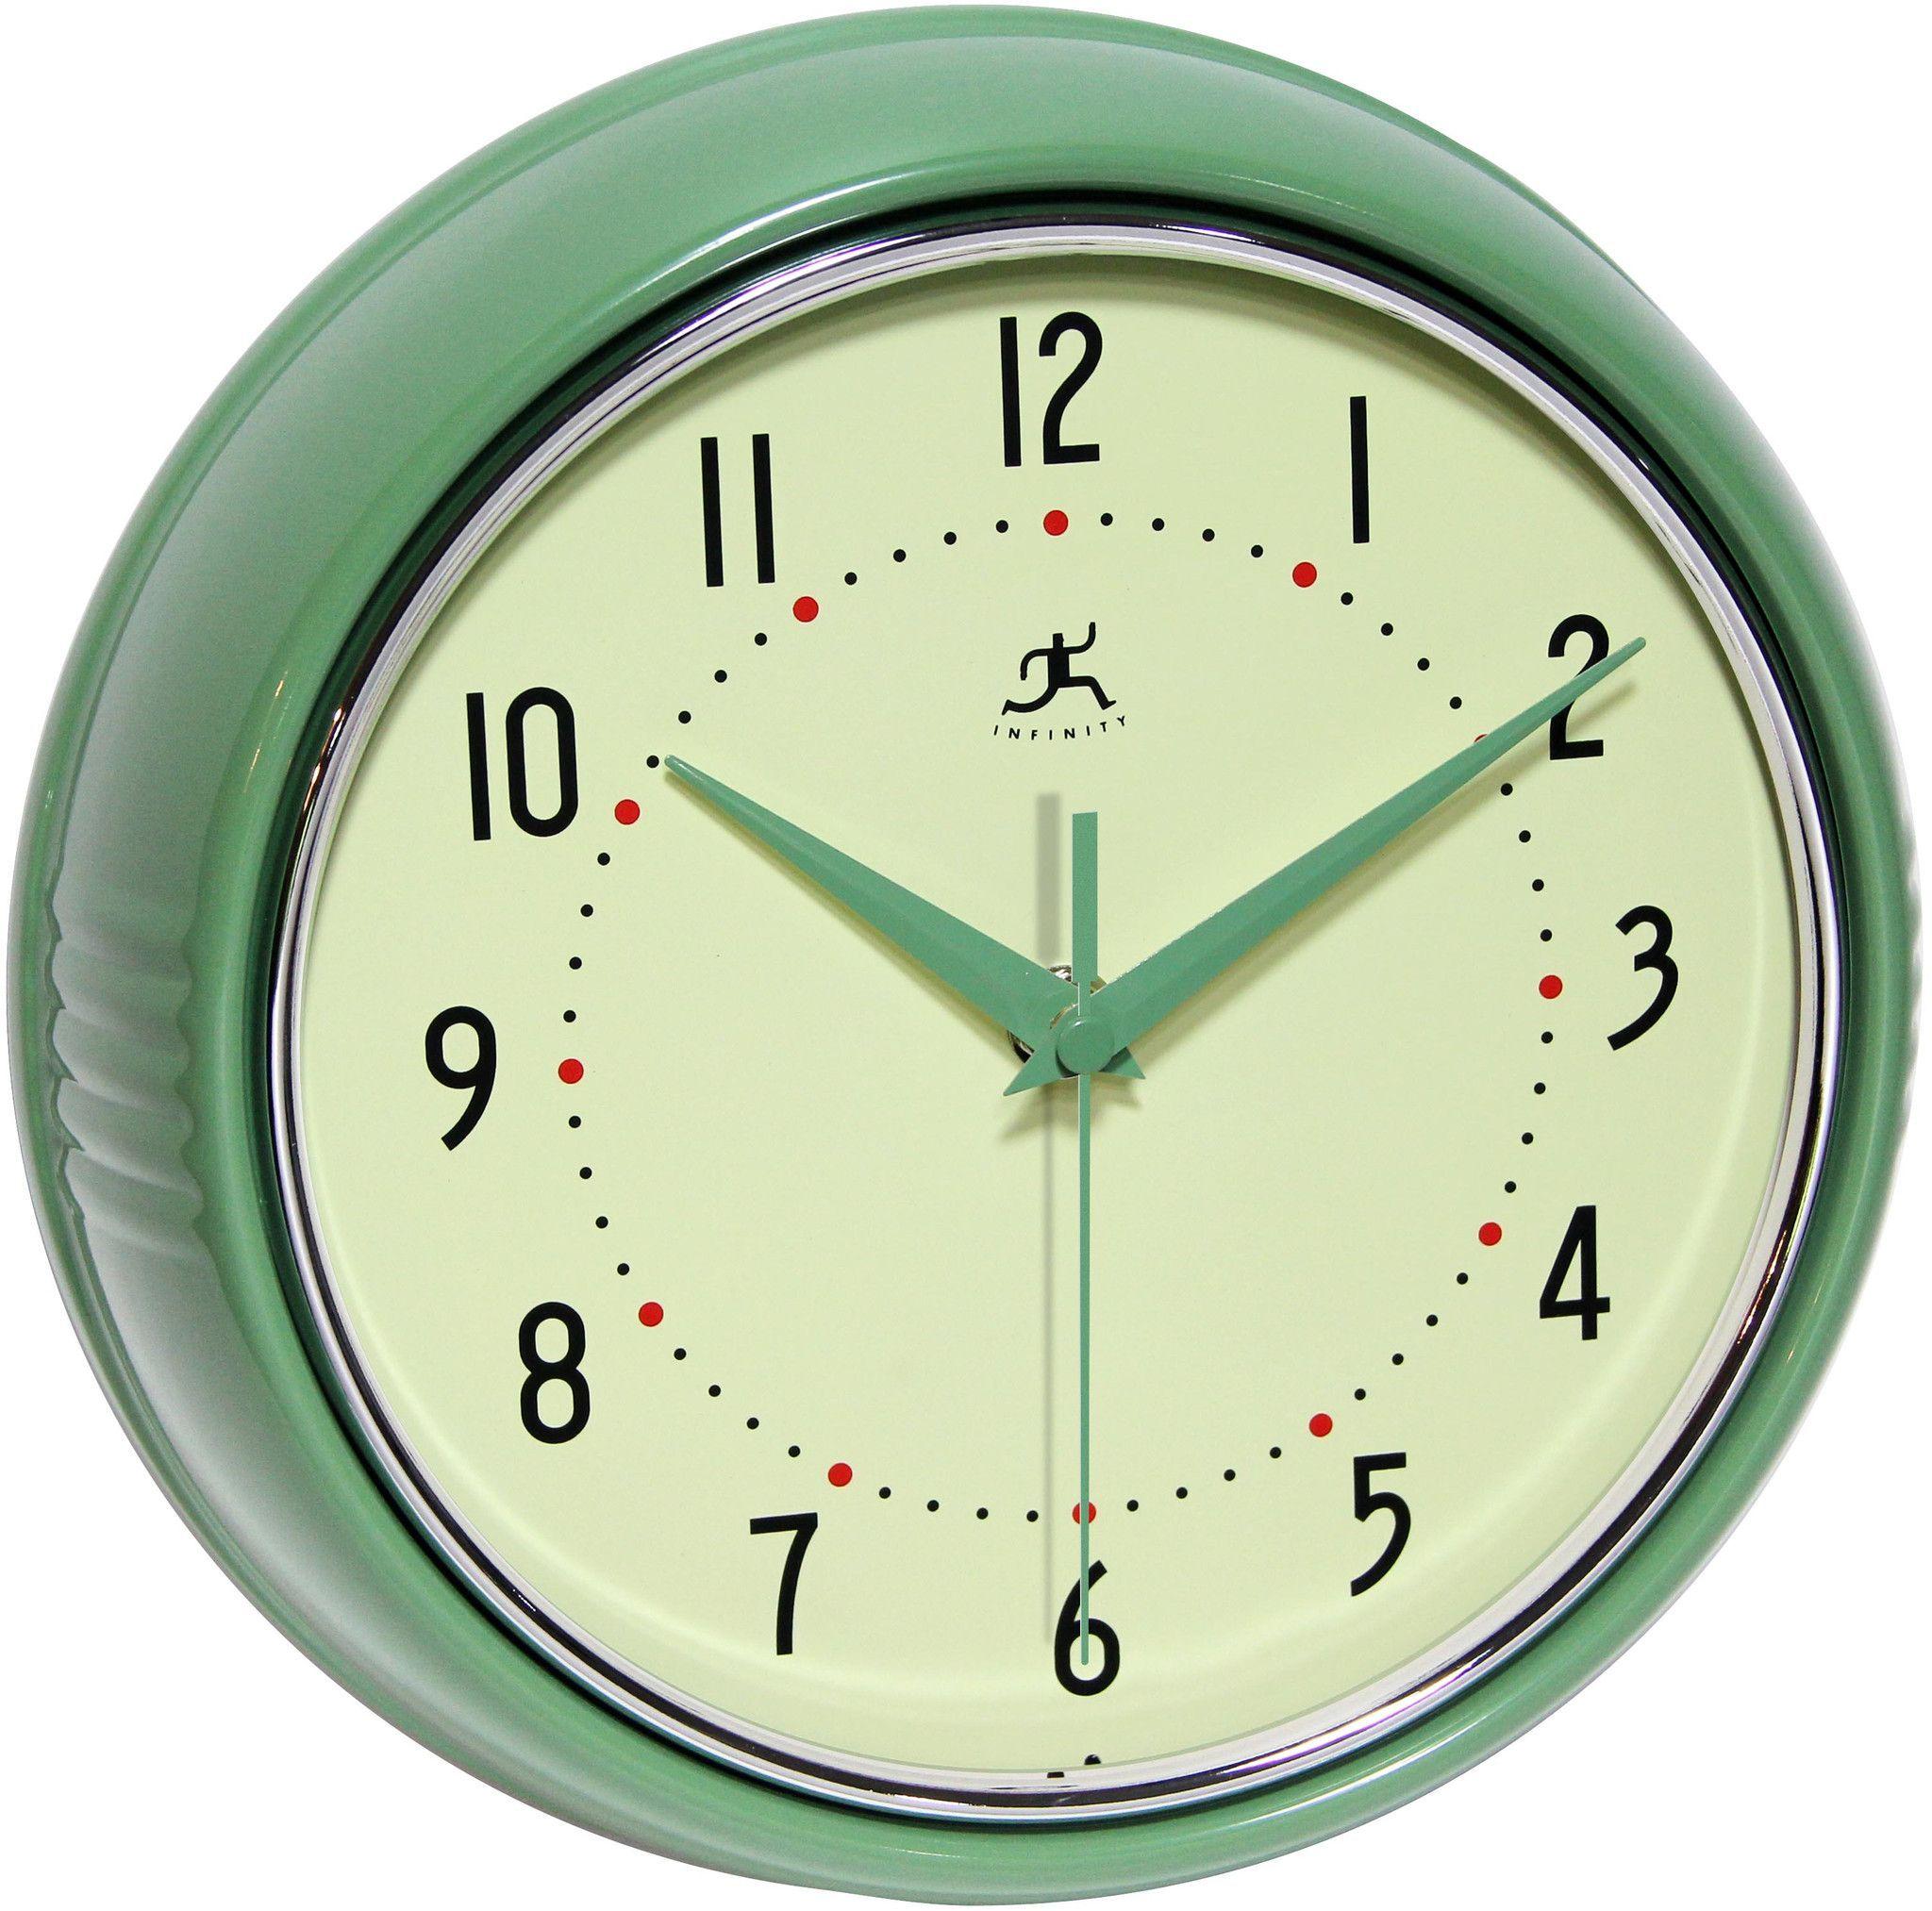 Retro Kitchen Wall Clocks Infinity Instruments Retro Green Wall Clock 10940 Green Products